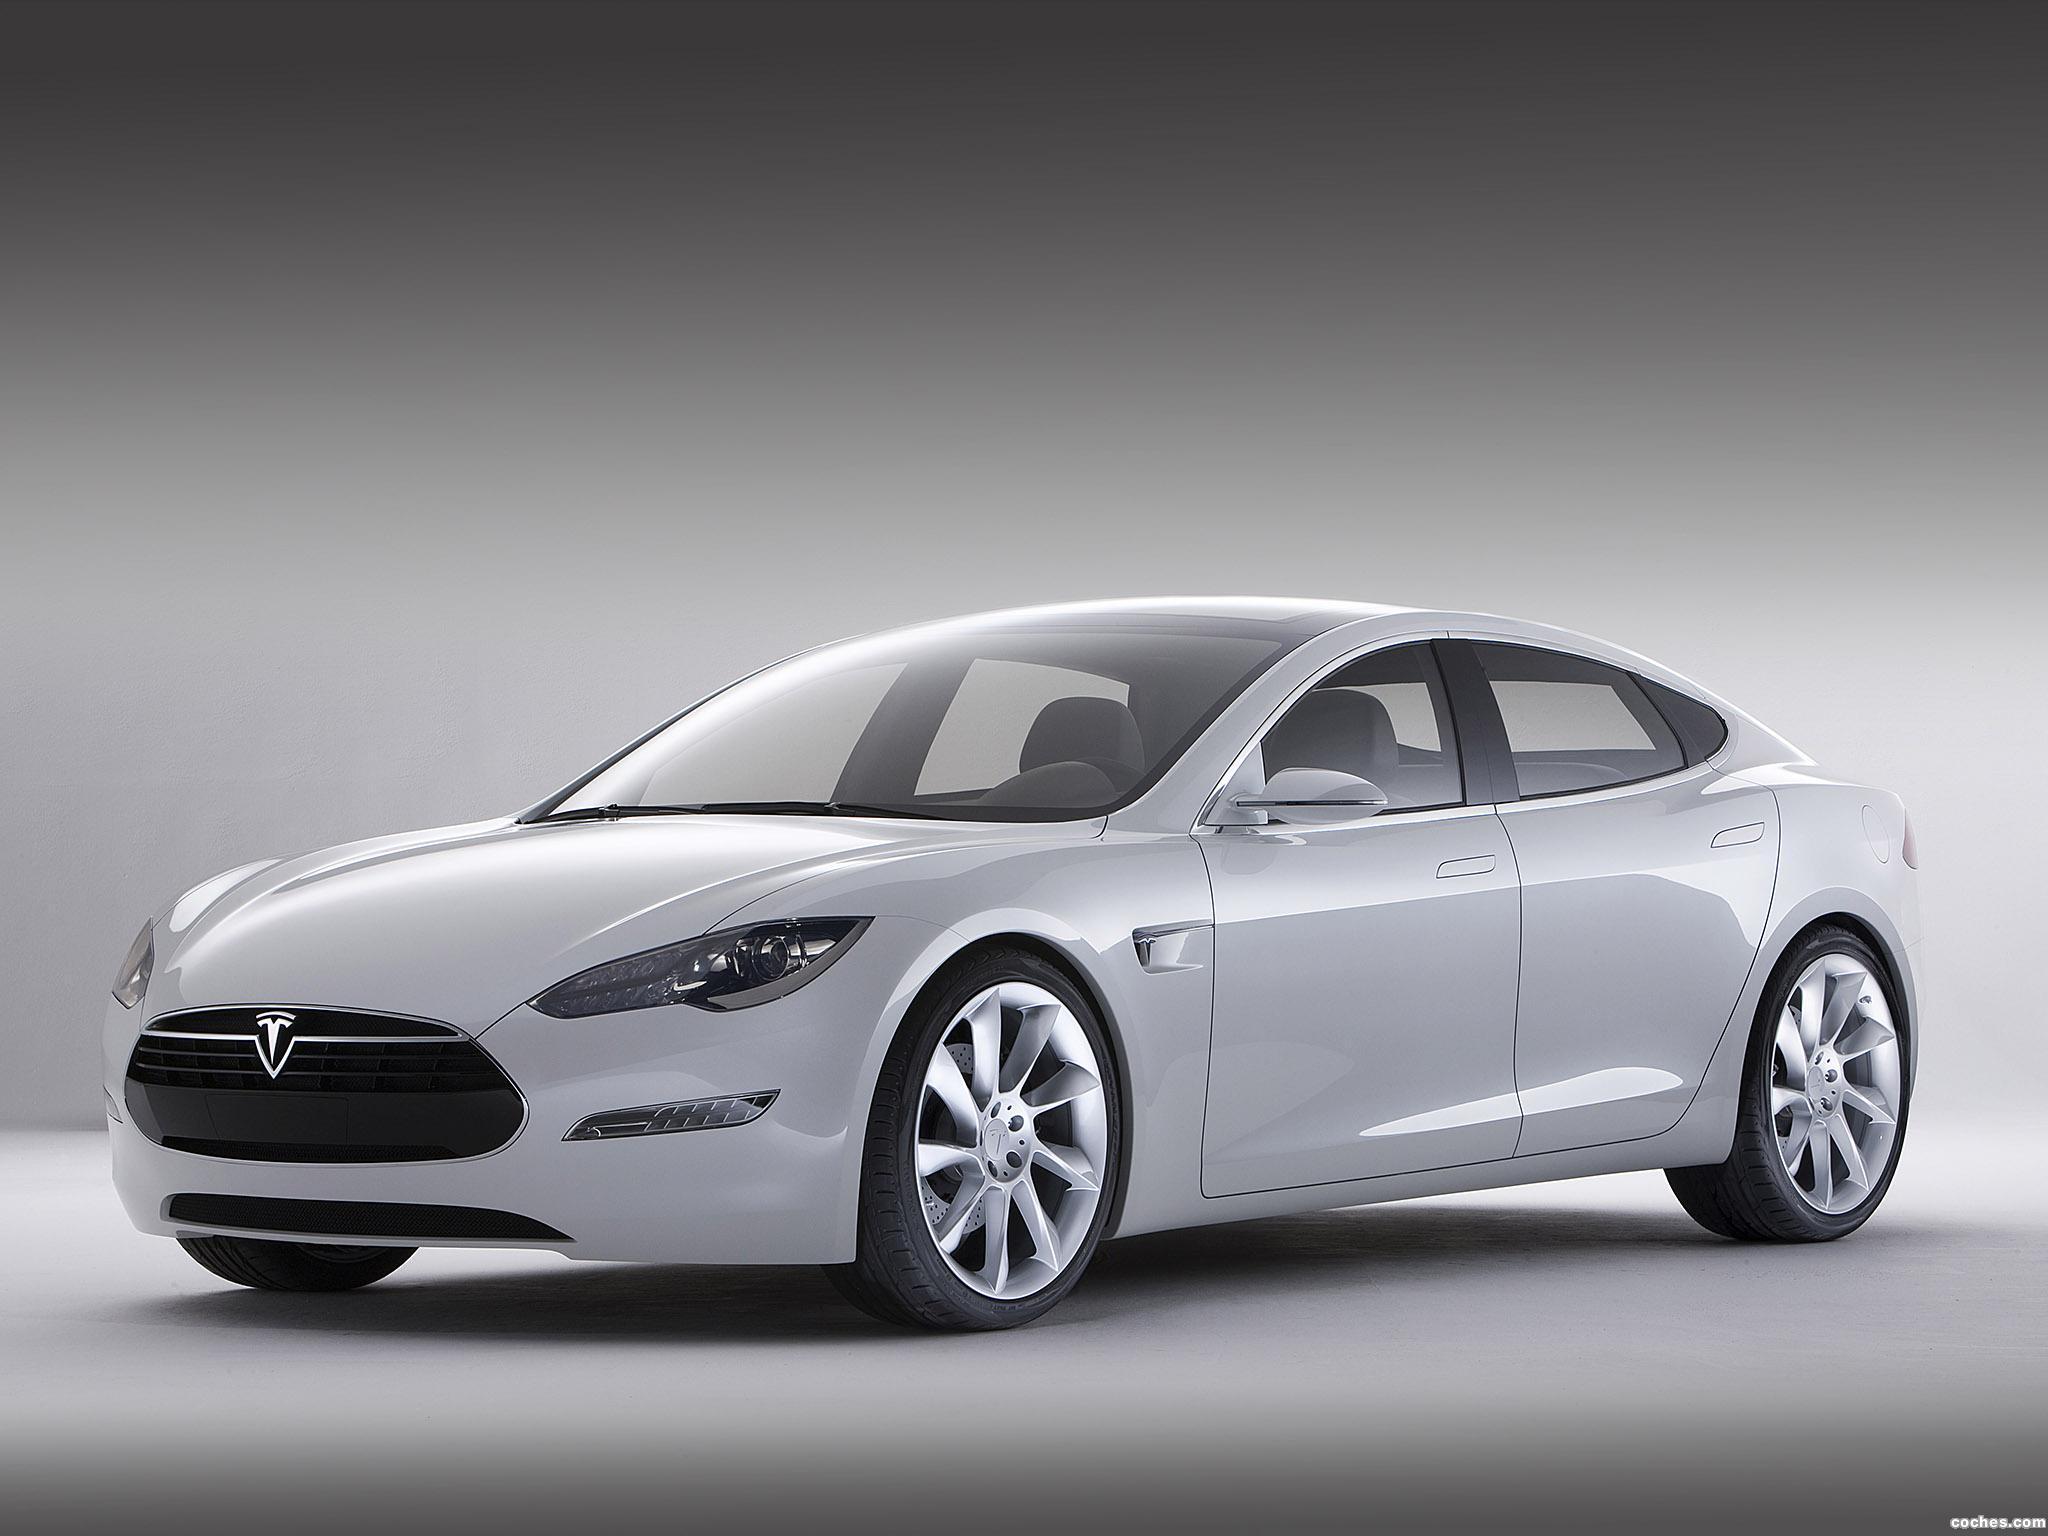 Foto 0 de Tesla Model S Concept 2009